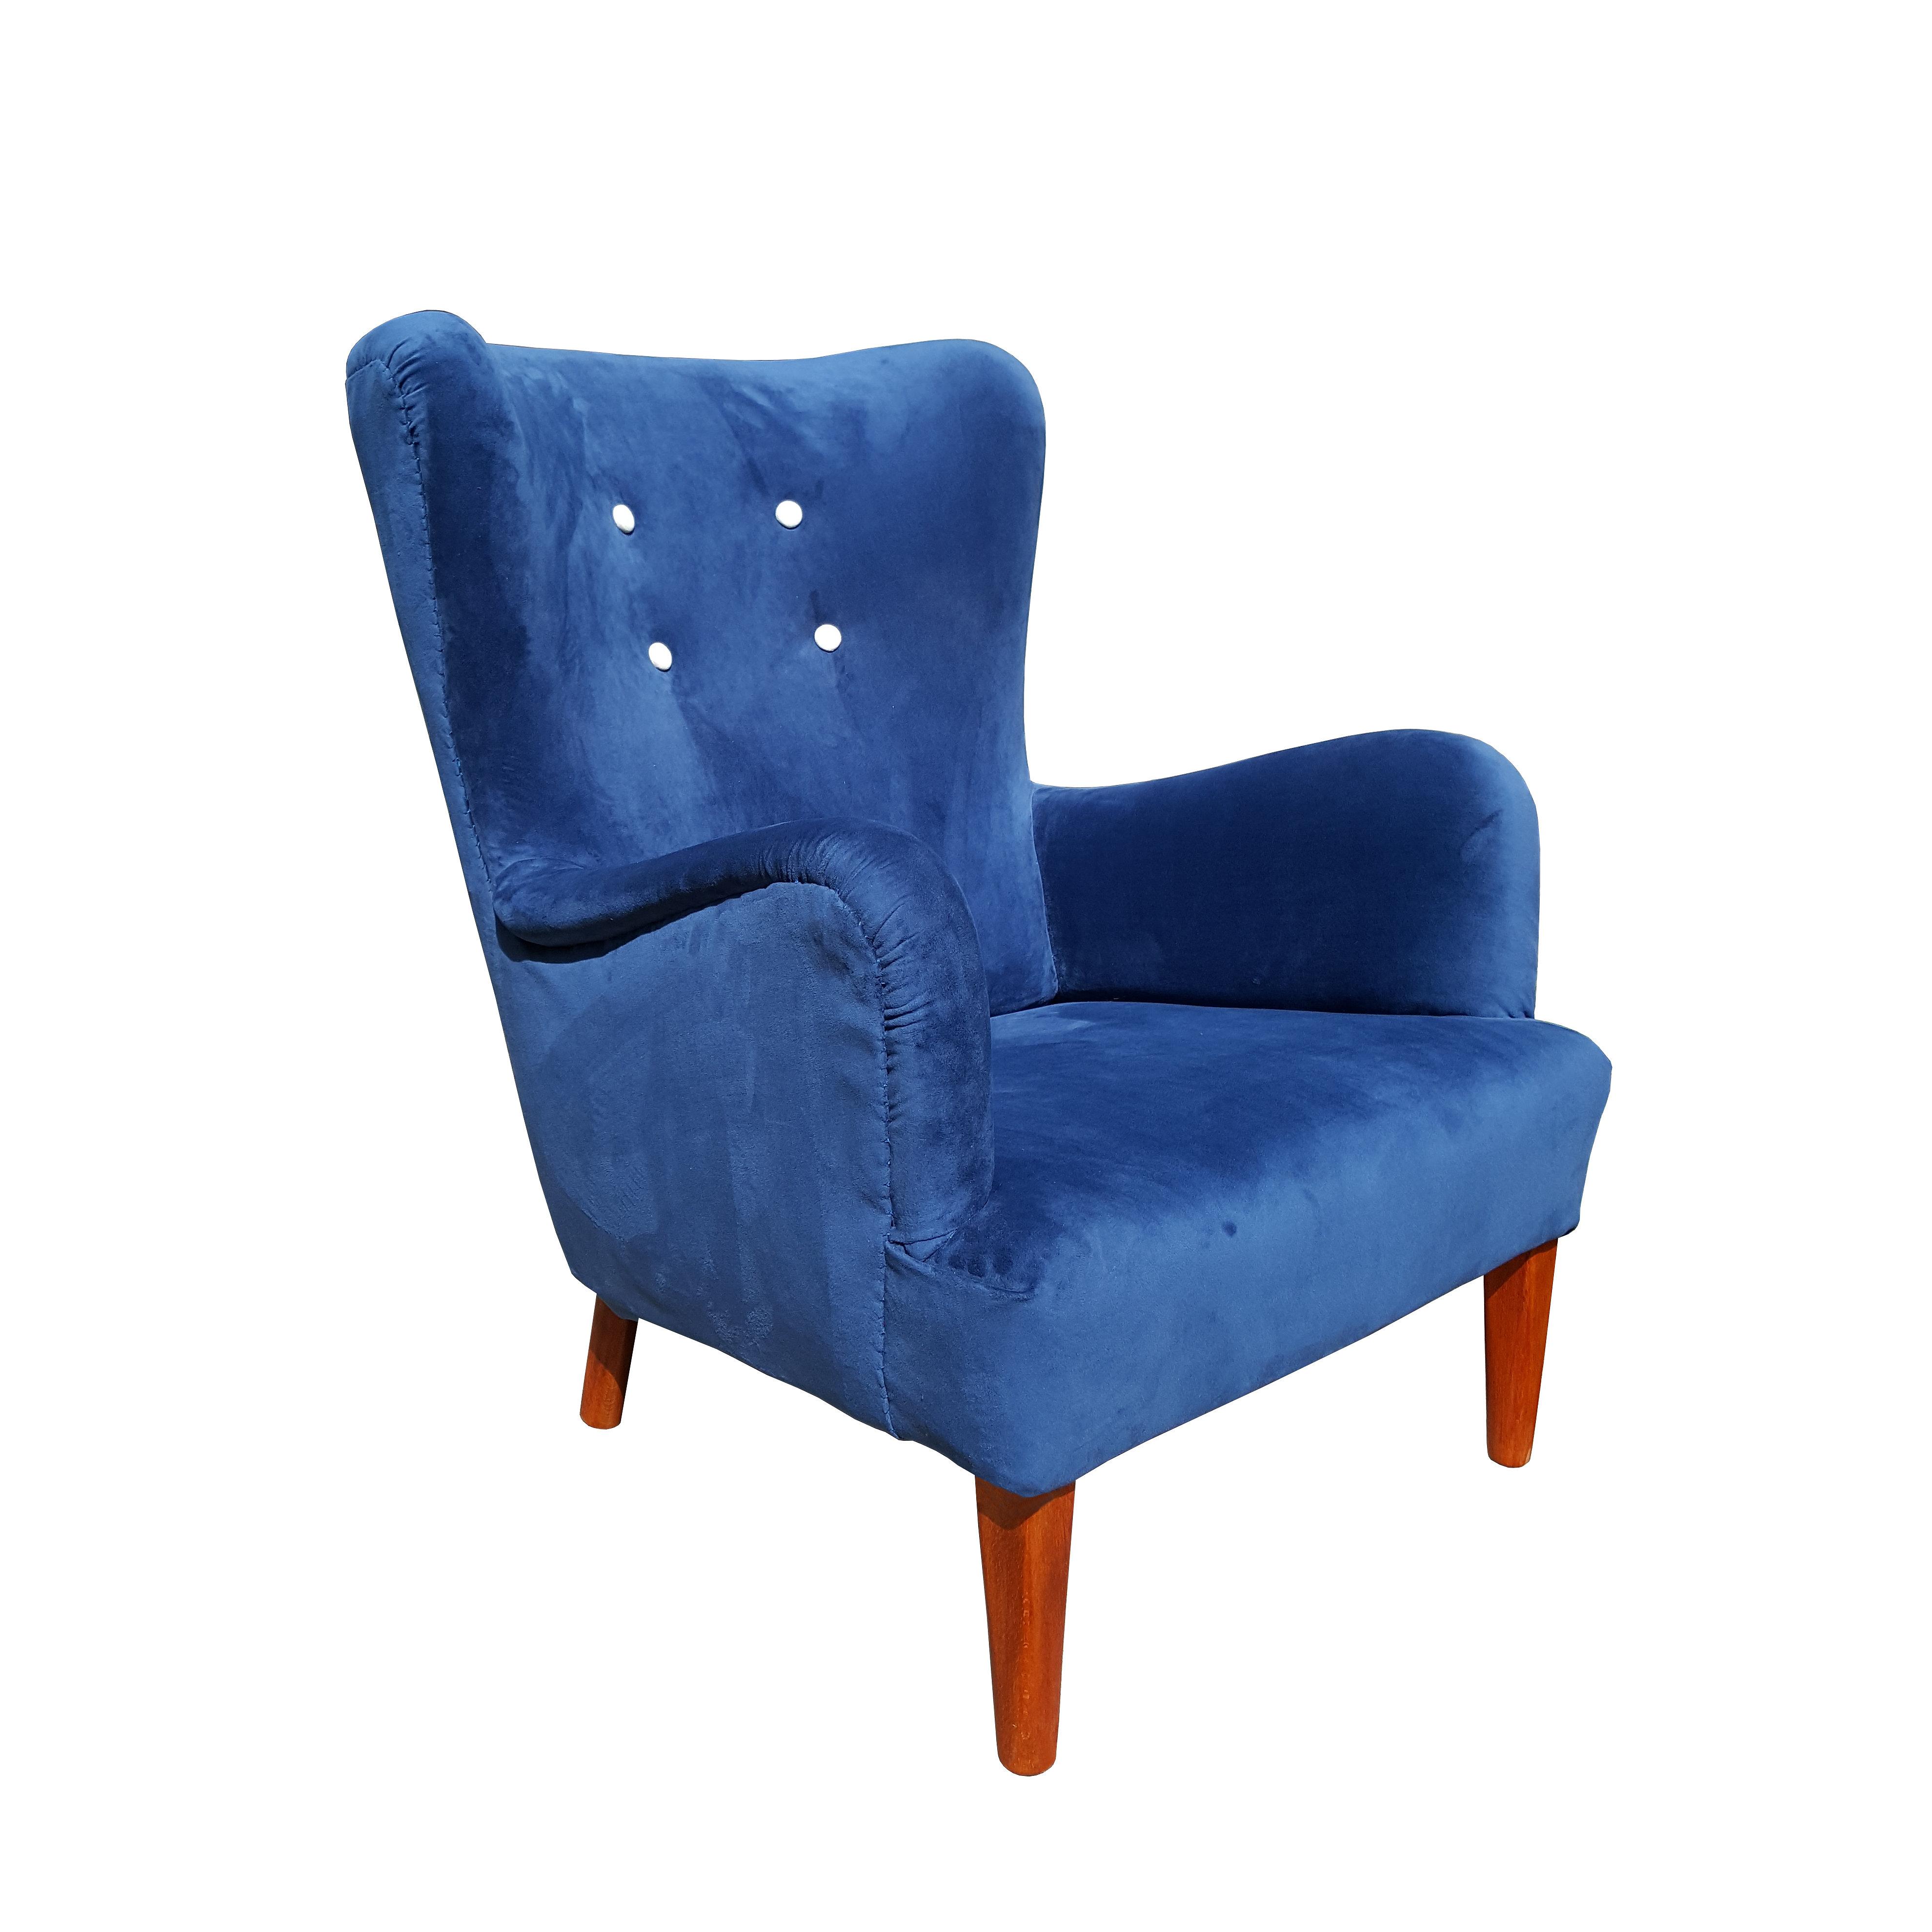 A.J. Iversen Danish 1940u0027s Wingback Chair